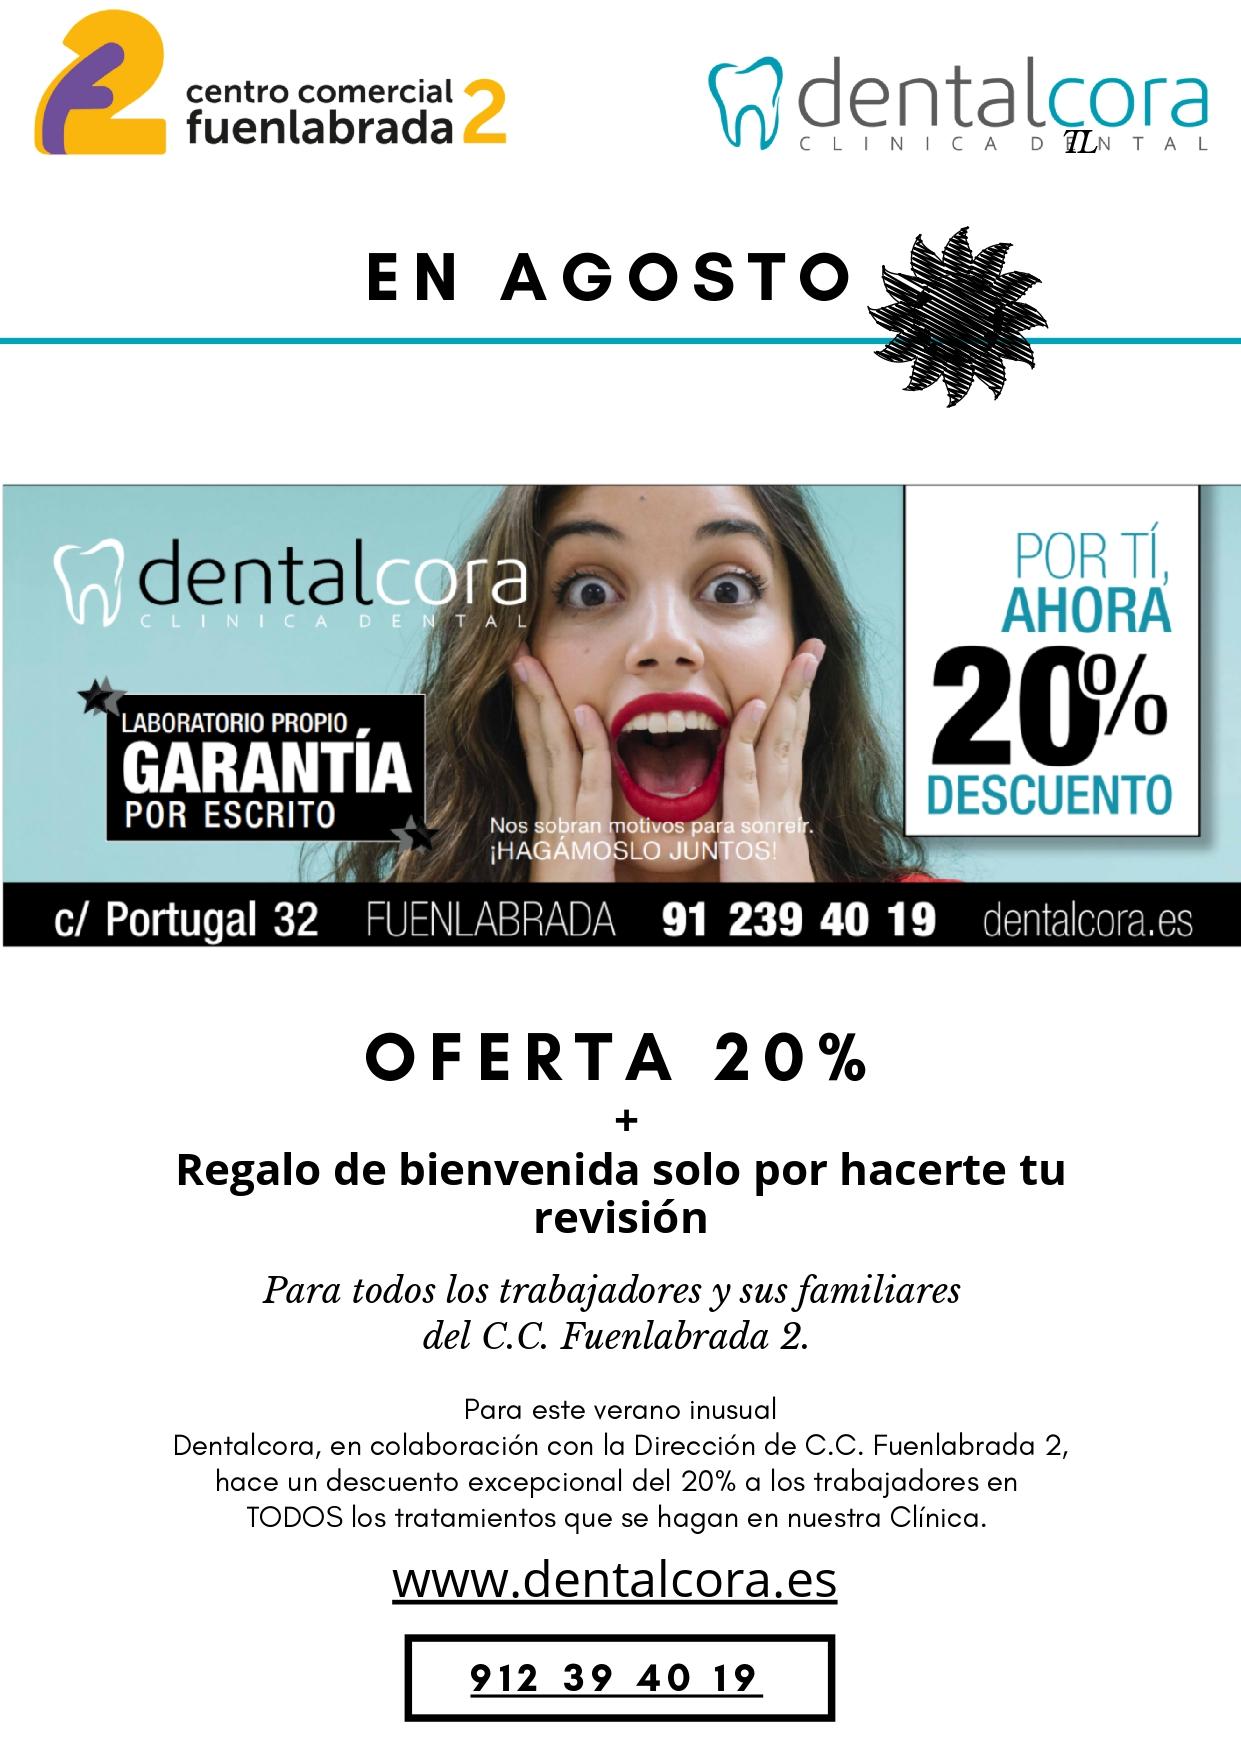 Oferta Dentalcora